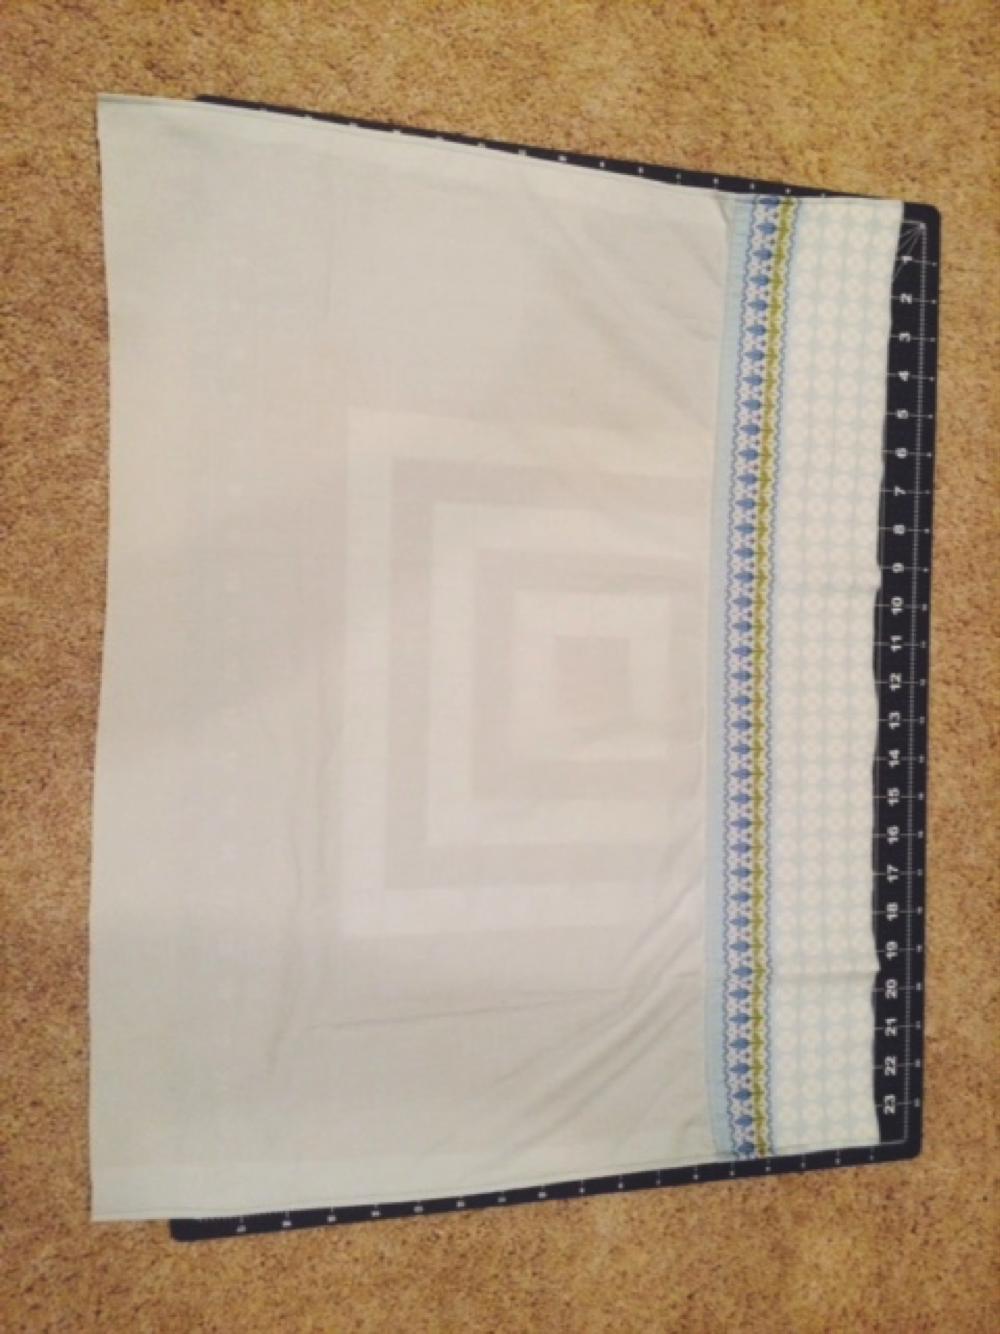 simple_sentimental_pillowcase_apron-4.jpeg